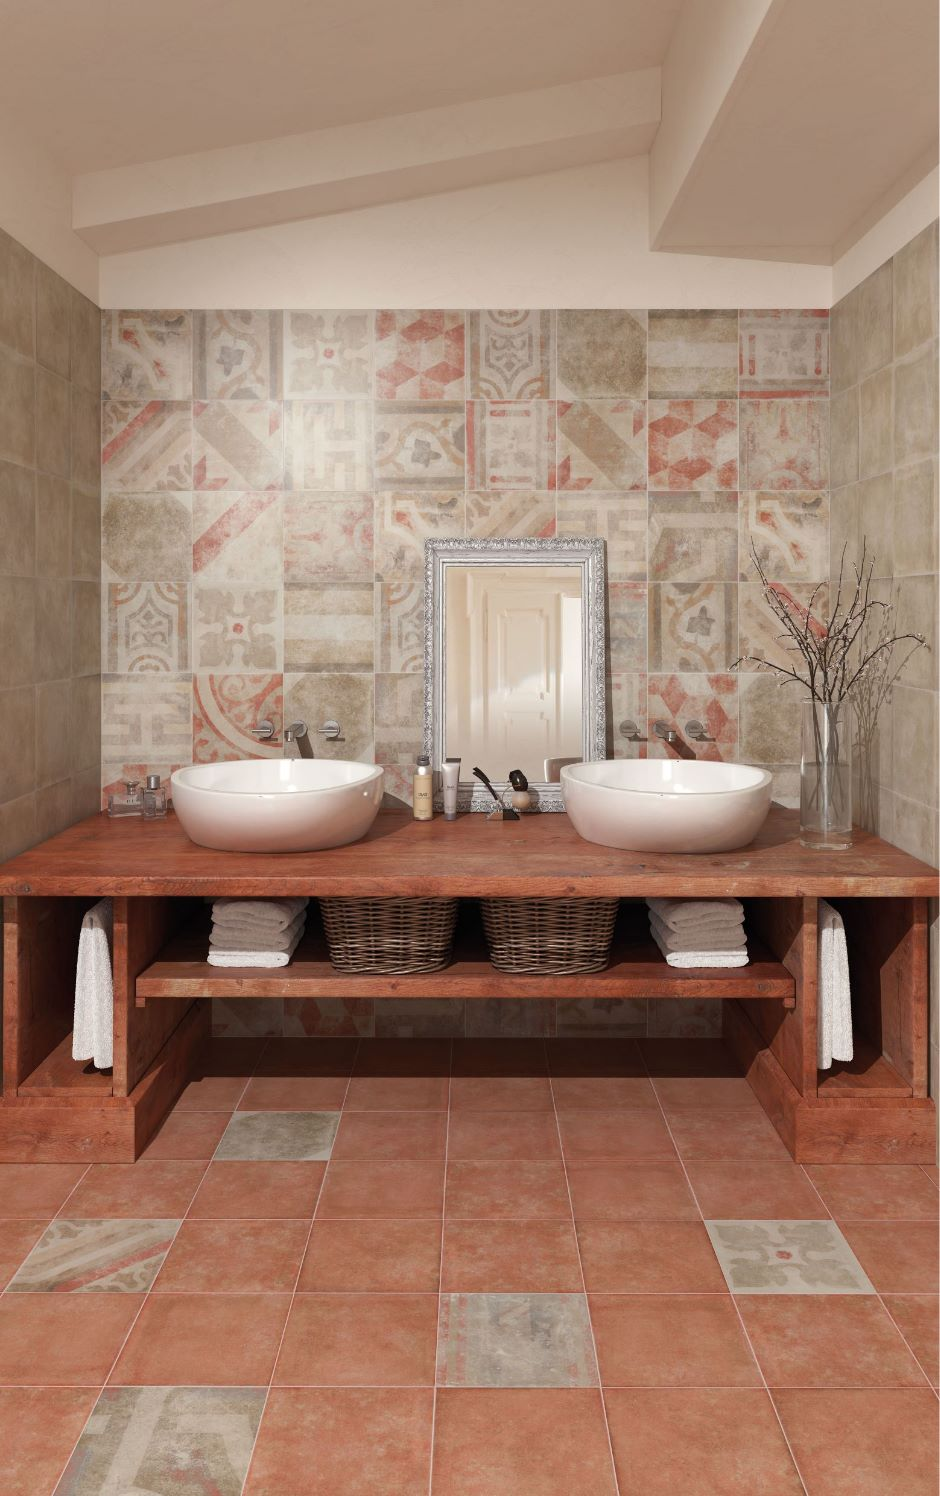 Pompei Antica Bath 25x25-0